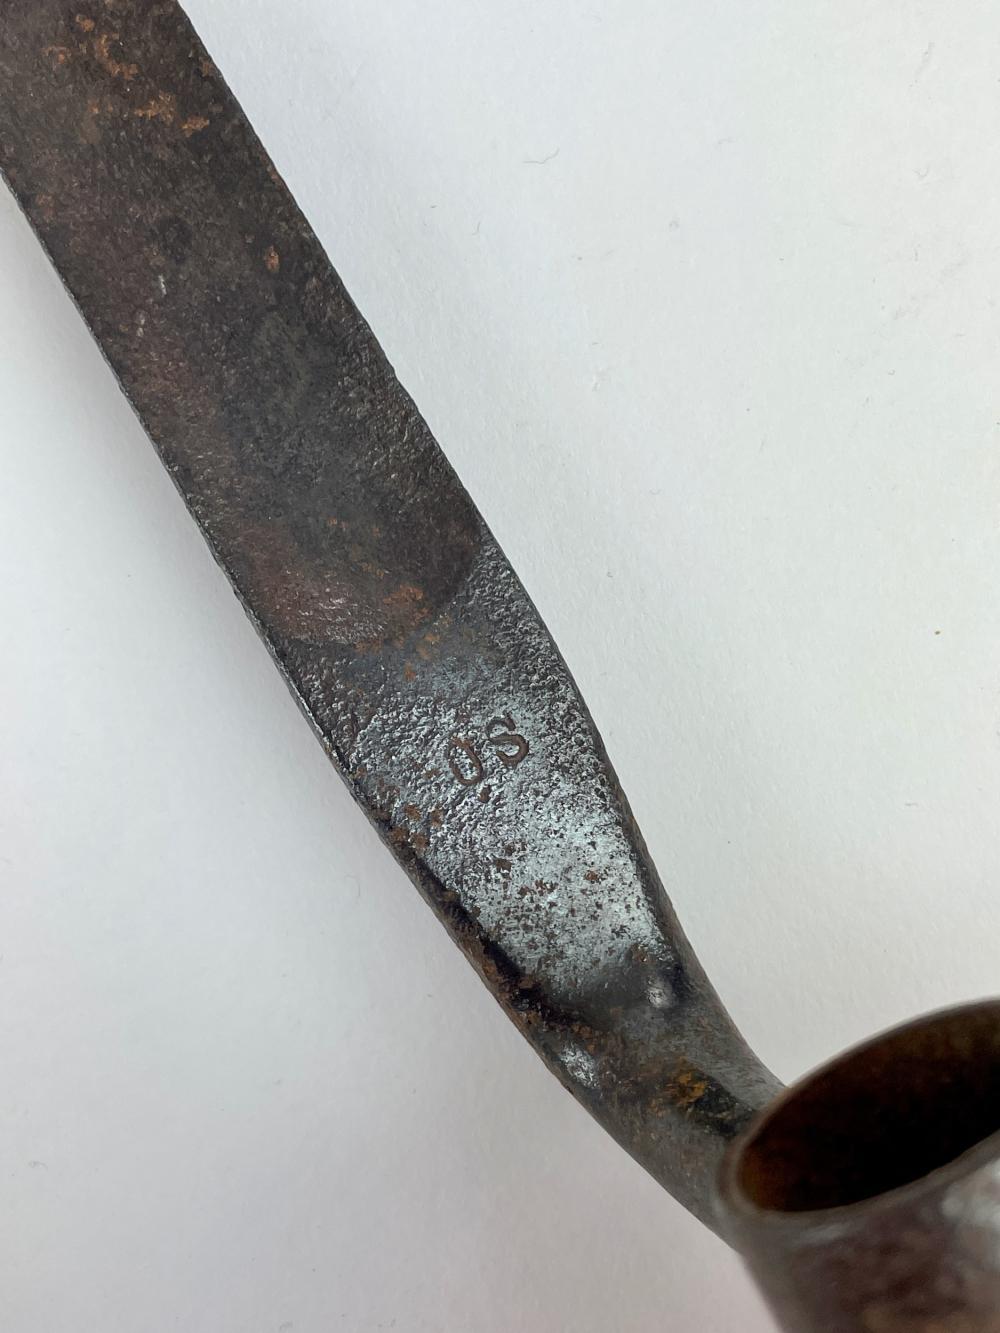 19th Century Sword and Bayonet